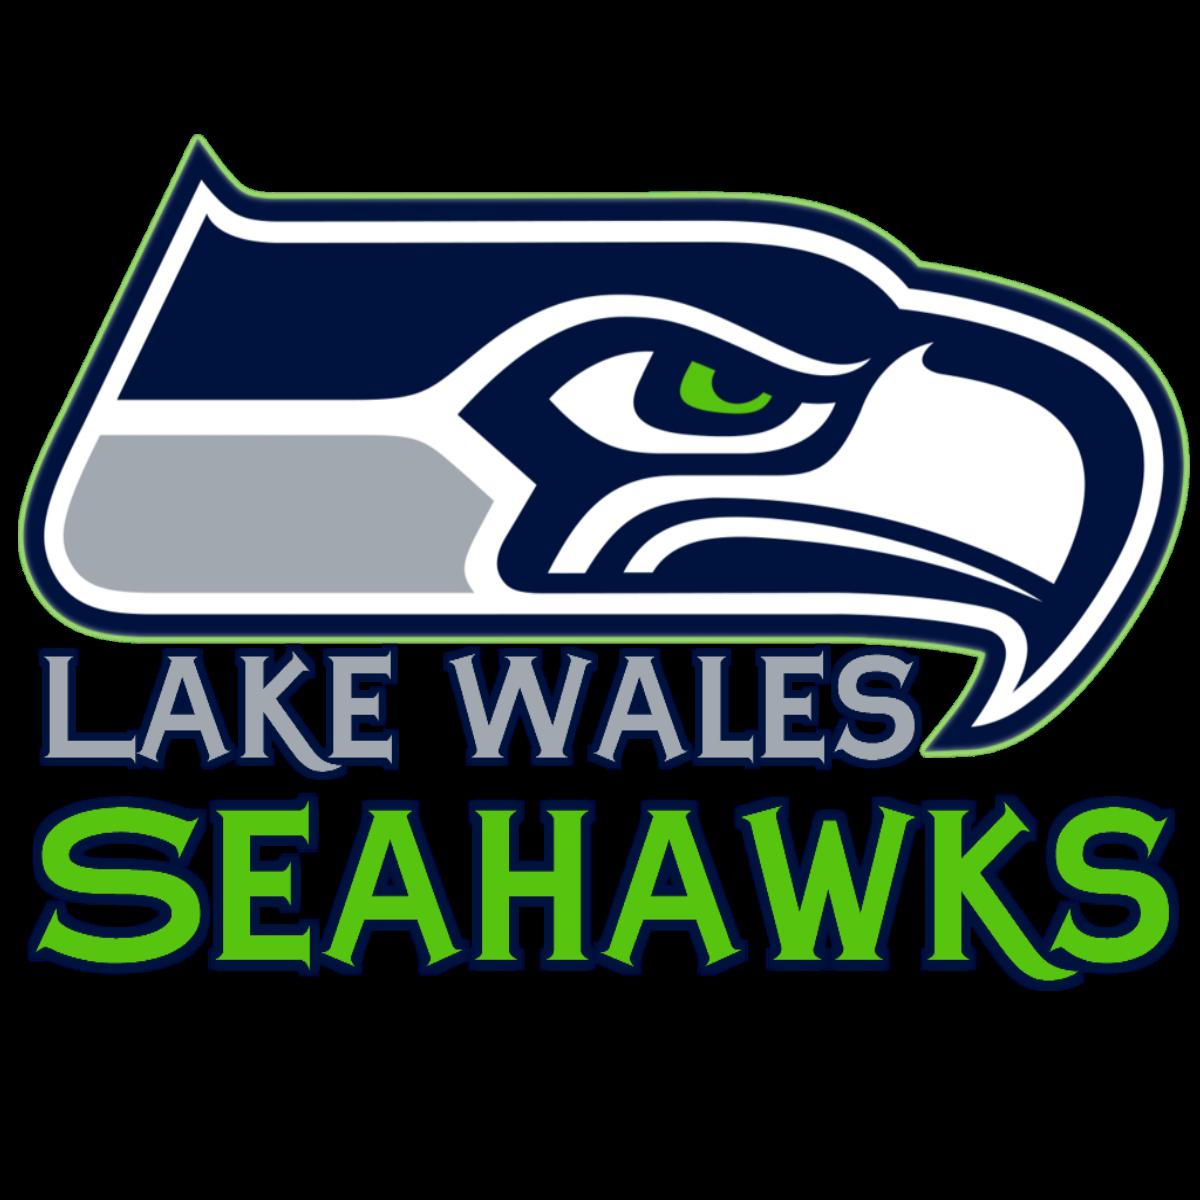 Lake Wales Seahawks